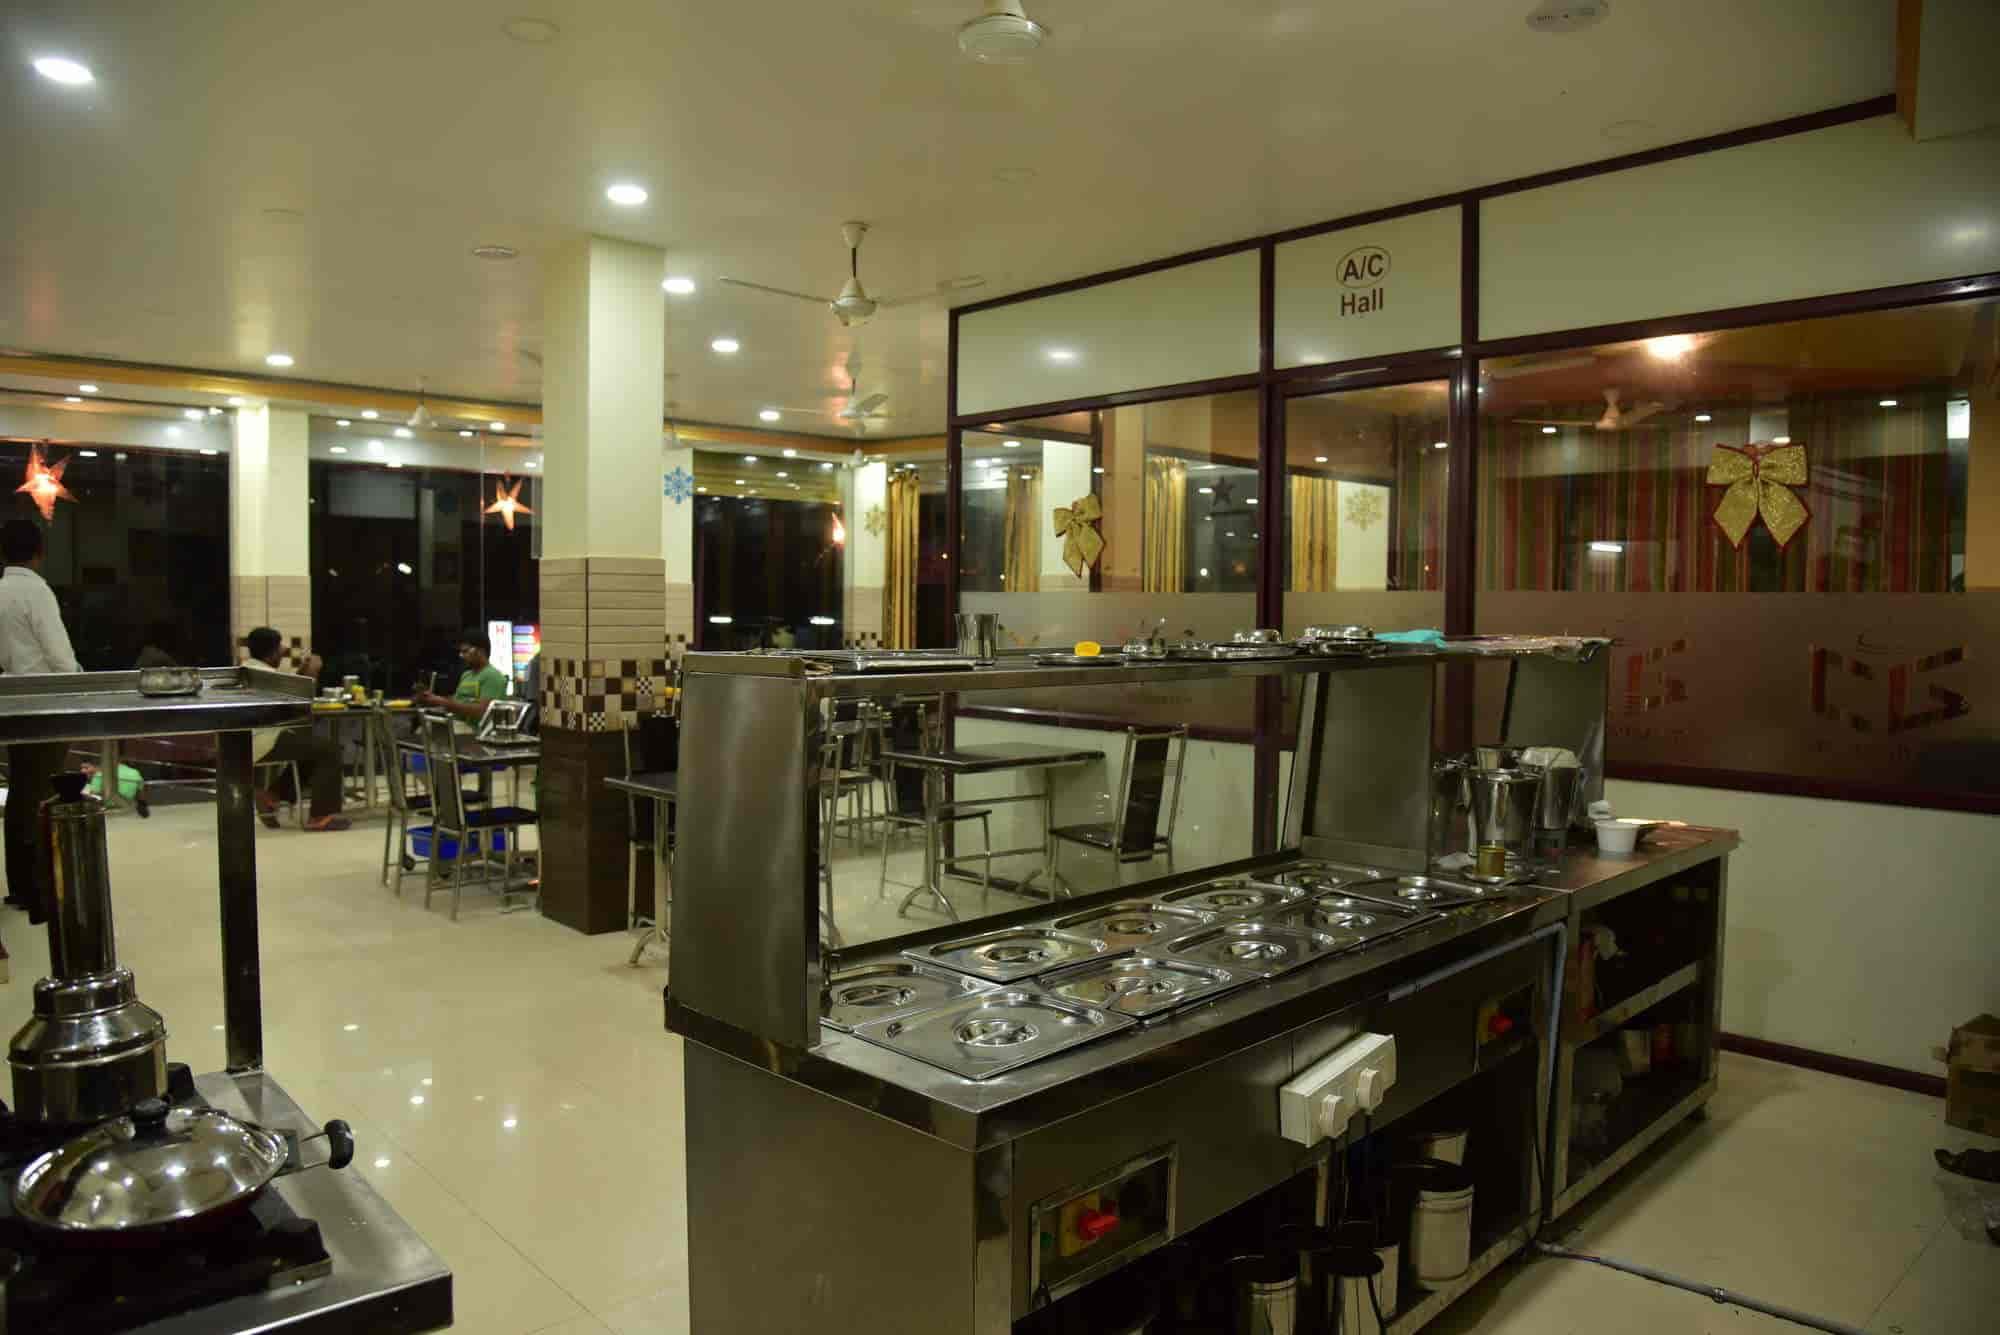 City Garden Restaurant Photos, Palayamkottai, Tirunelveli- Pictures ...